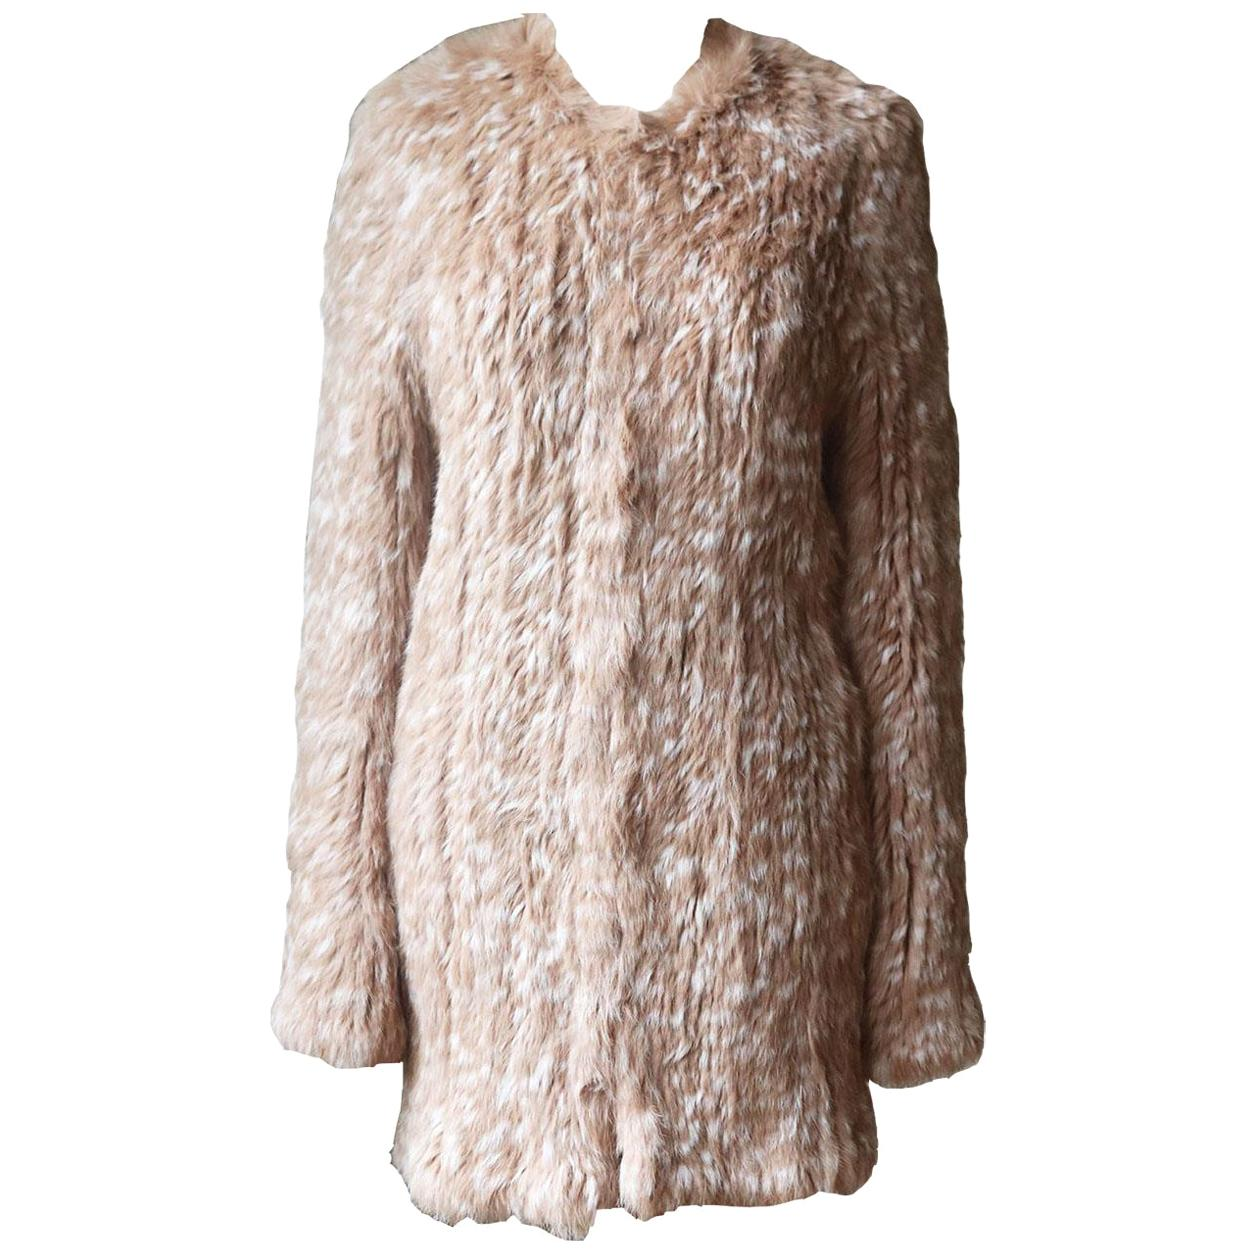 Ulla Johnson Christa Printed Rabbit Fur Coat